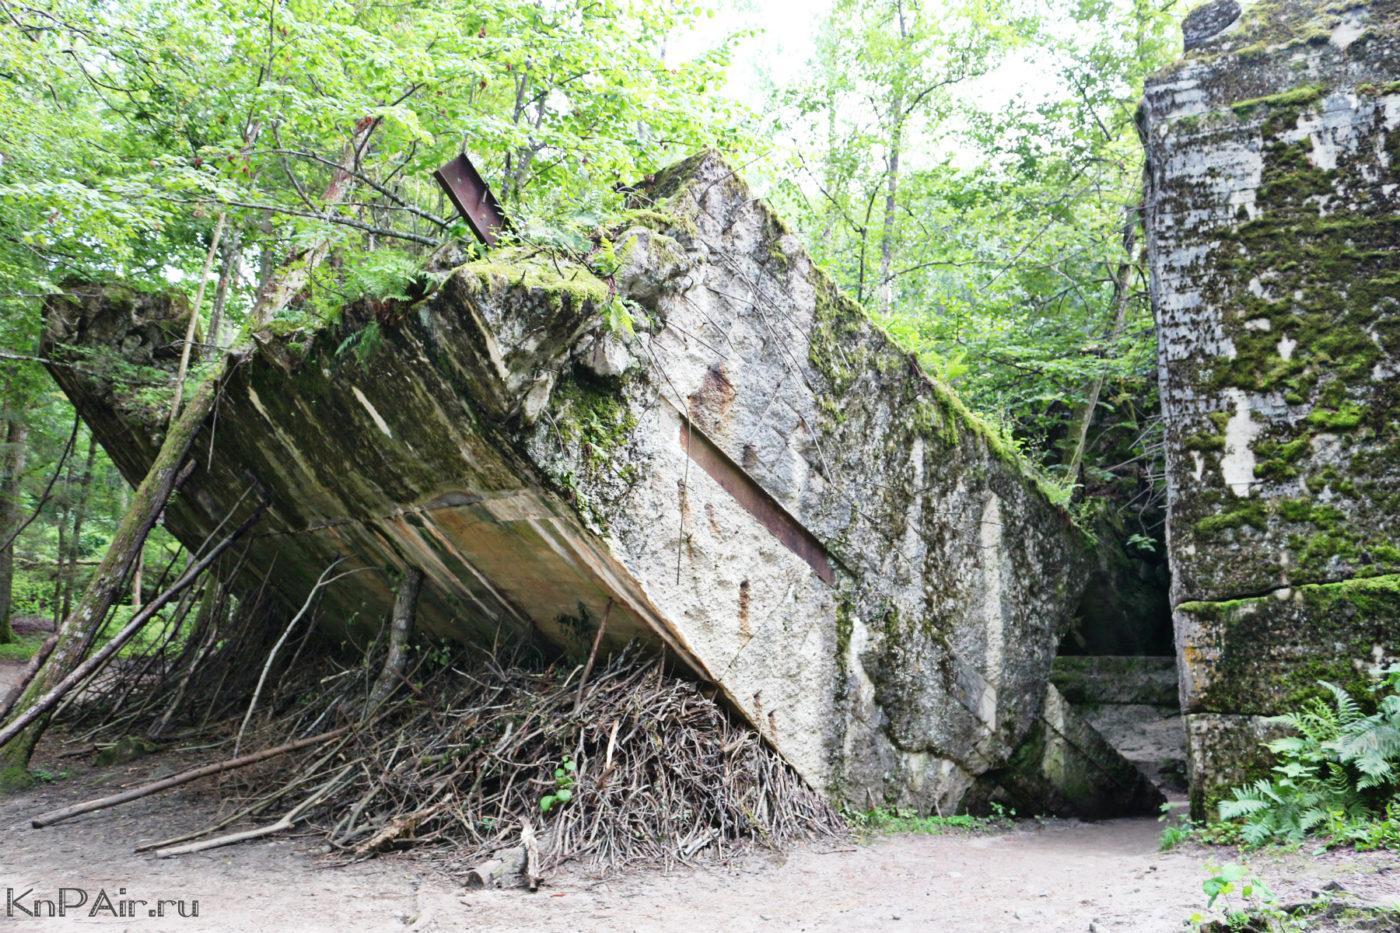 Plita-s-Armaturoi-v-Volchiem-logove